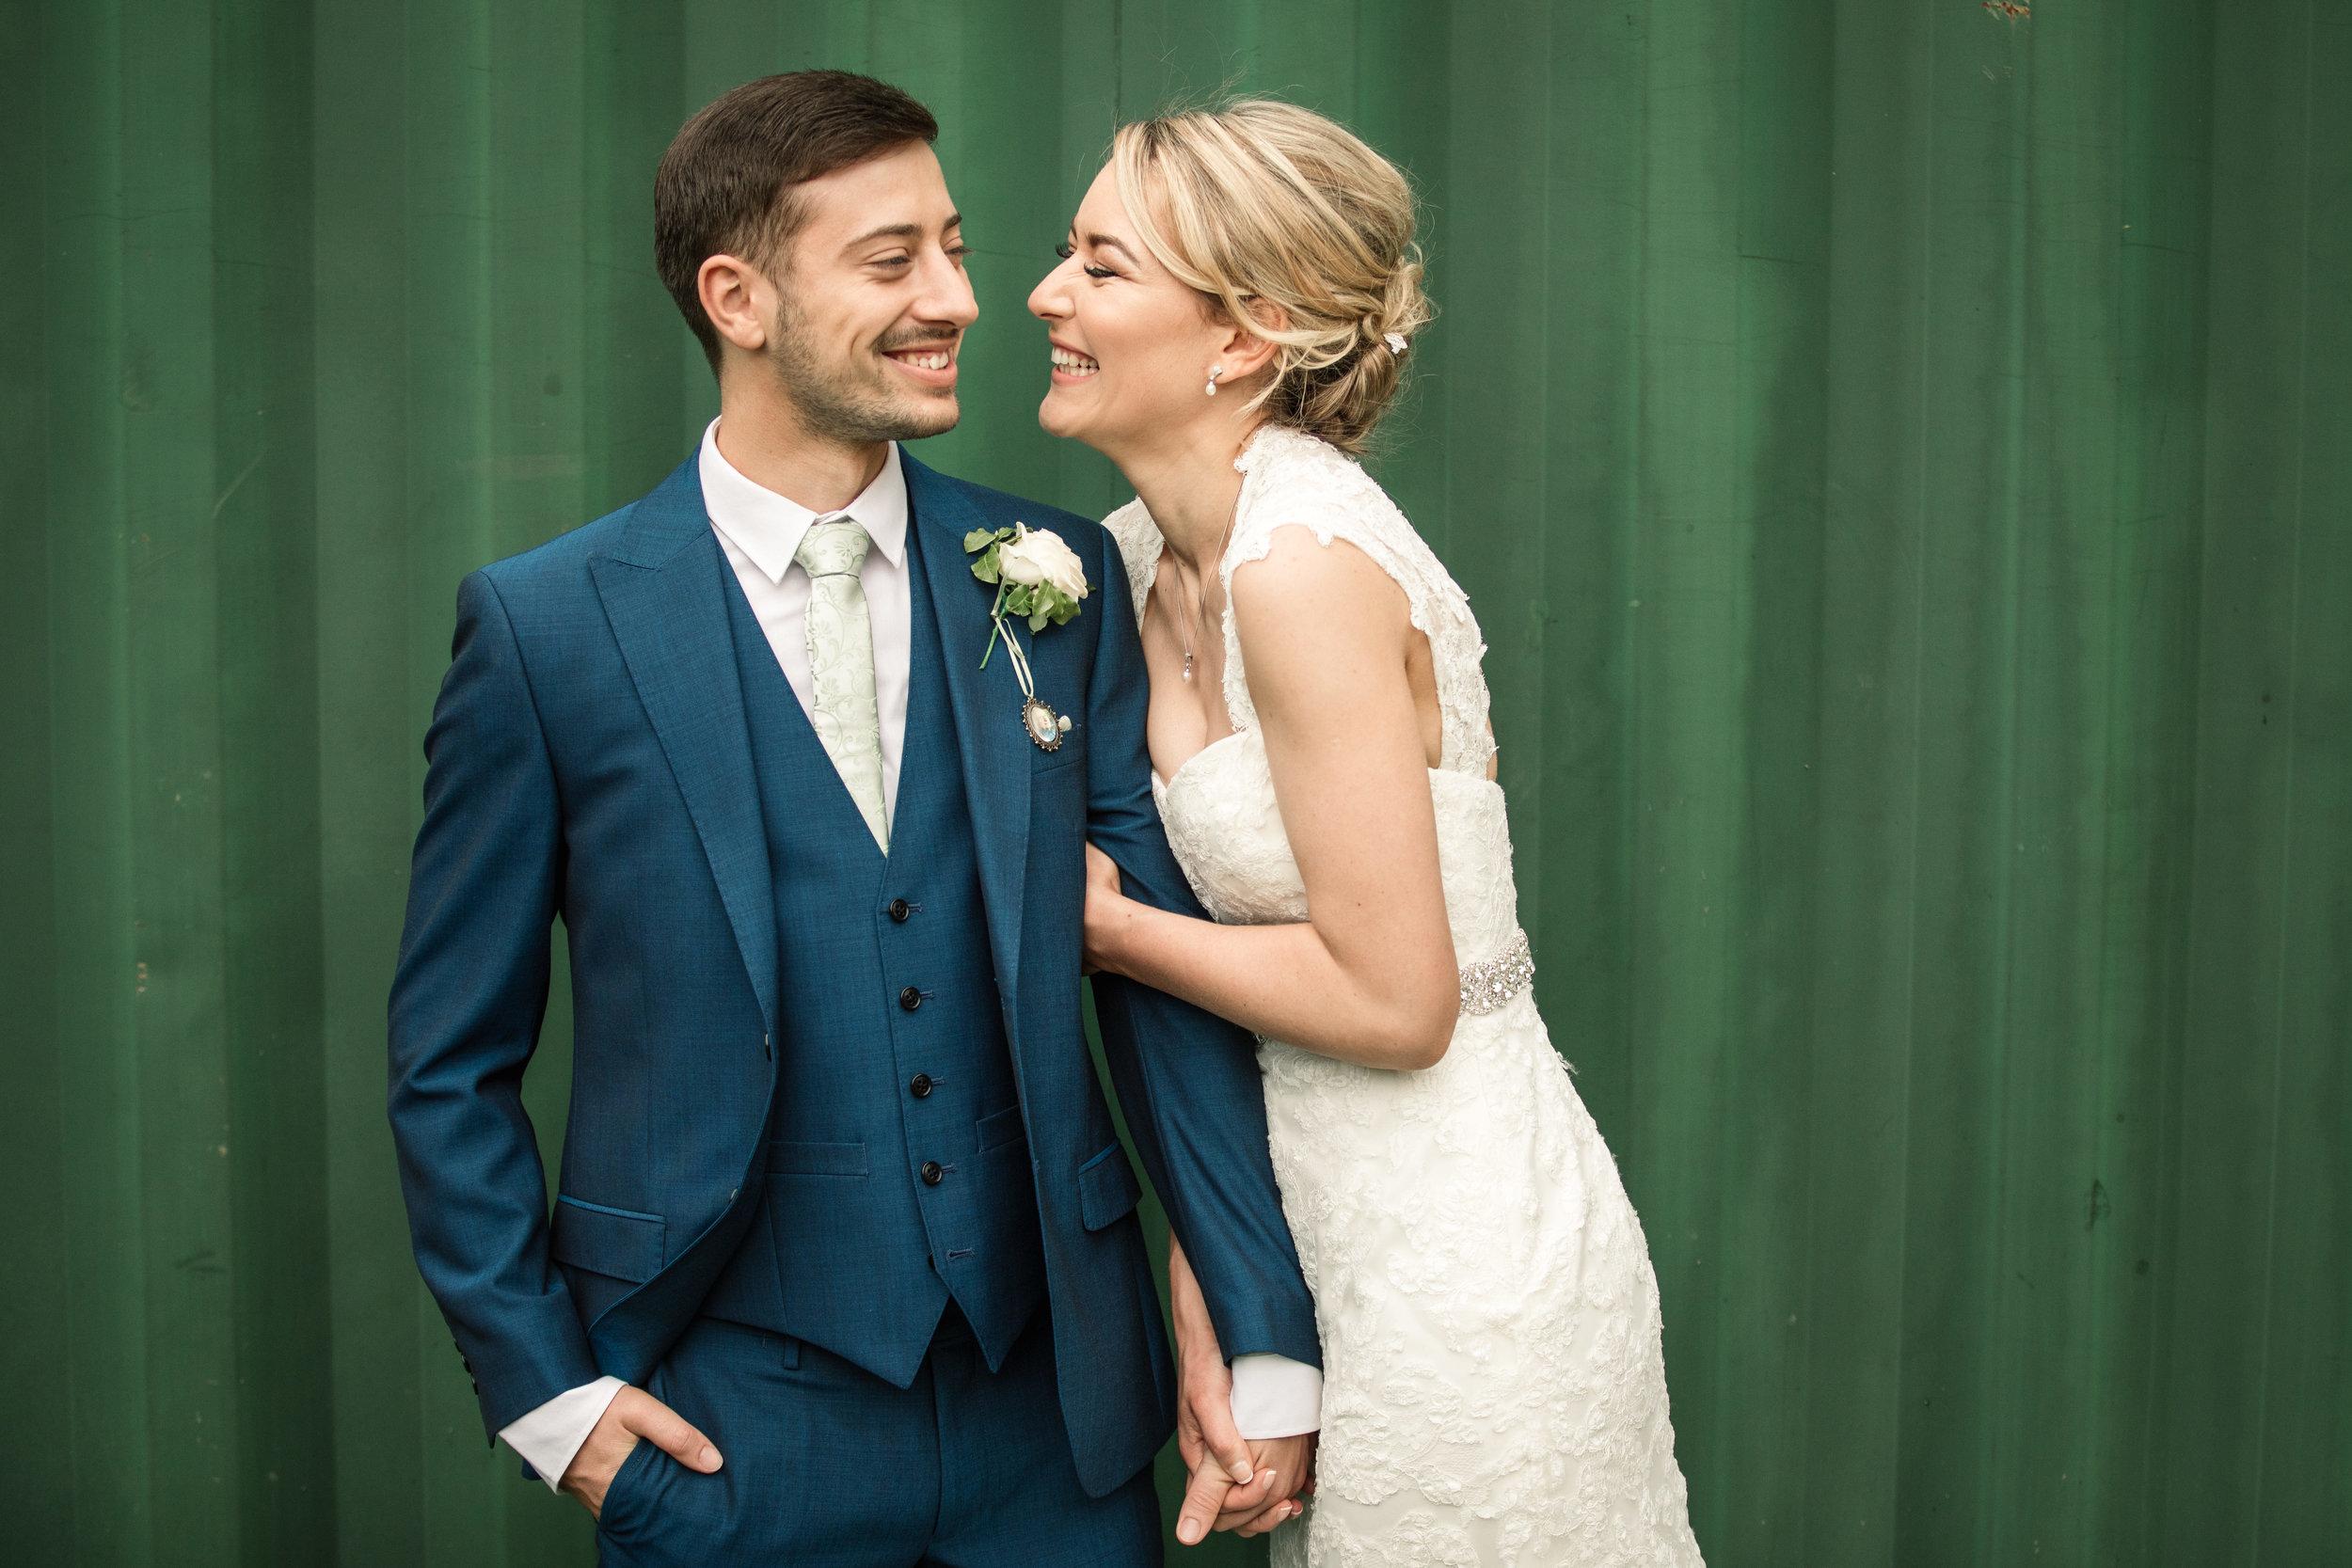 becky-harley-photography-hertfordshire-wedding-photographer-009.JPG